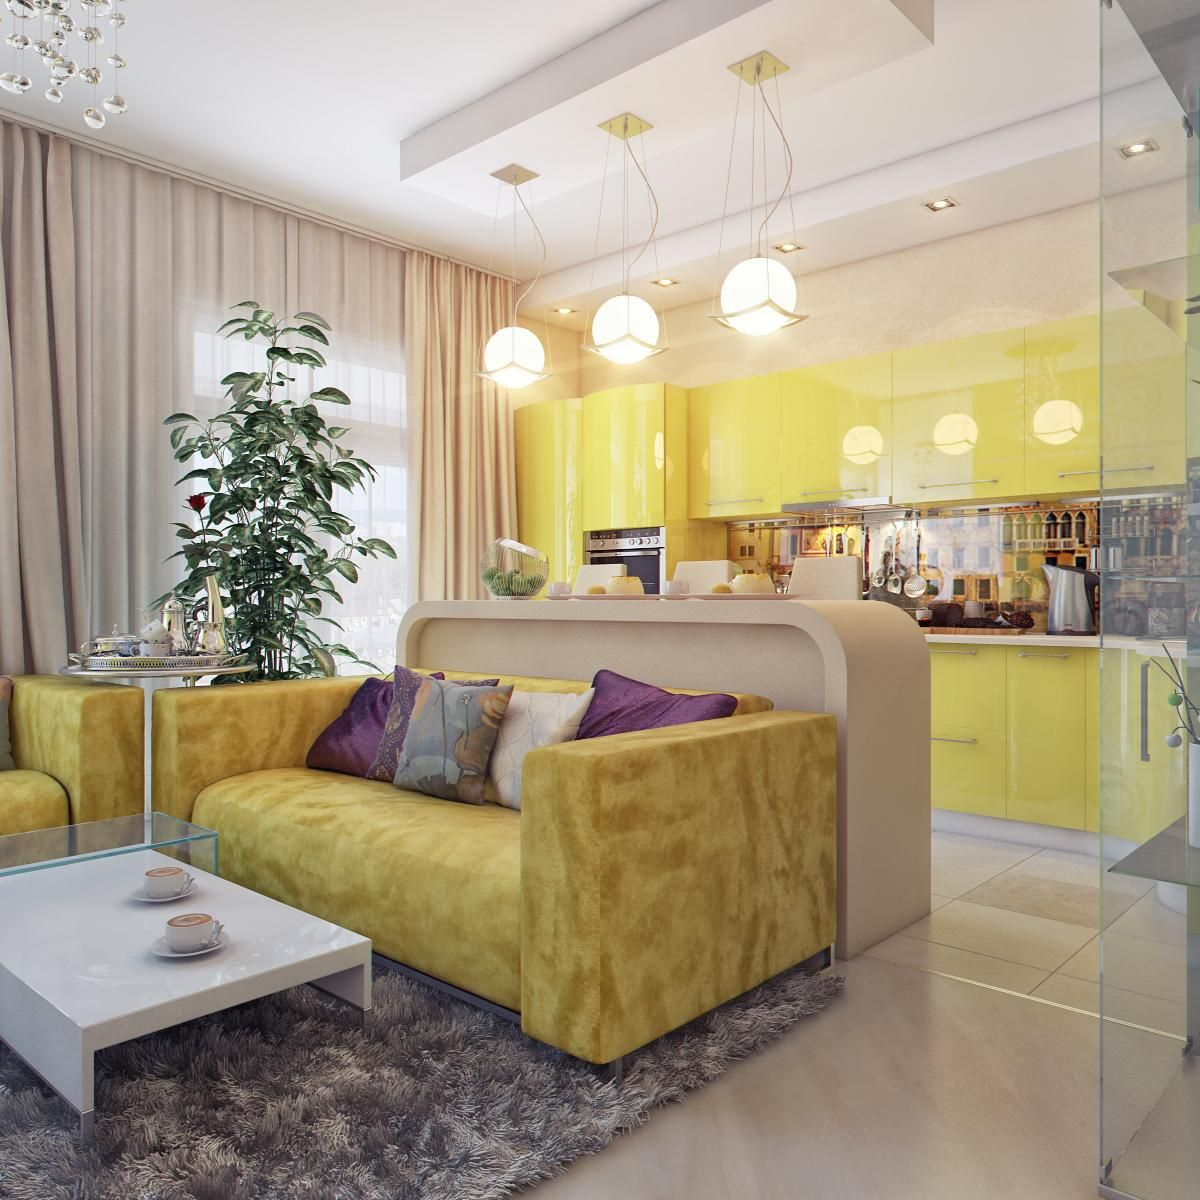 Original living room and bedroom zoning ideas 36